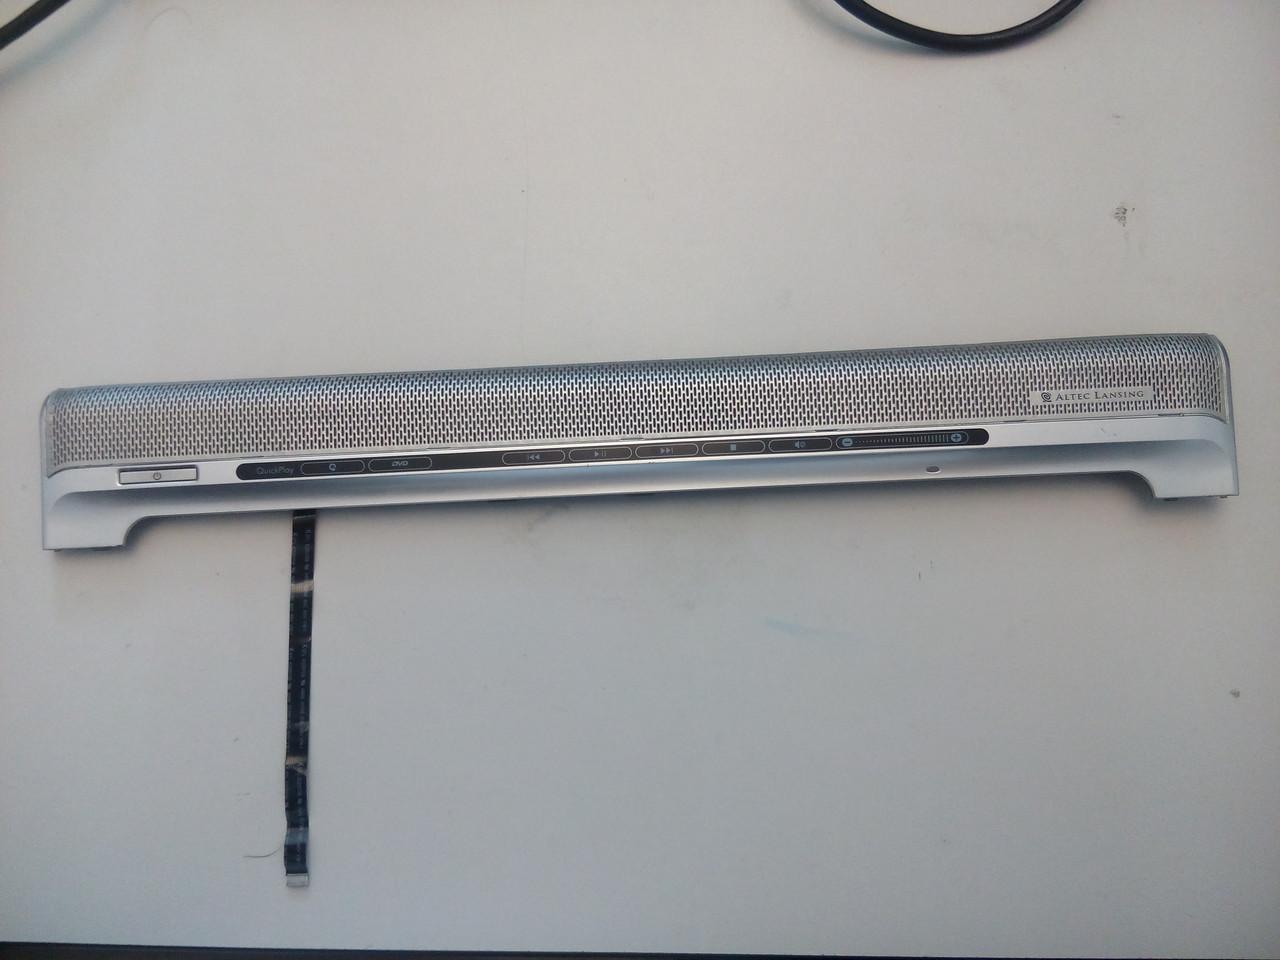 Сенсорна панель с динамиками HP Pavilion DV6000 DV6500 DV6700 Series ebat3021015